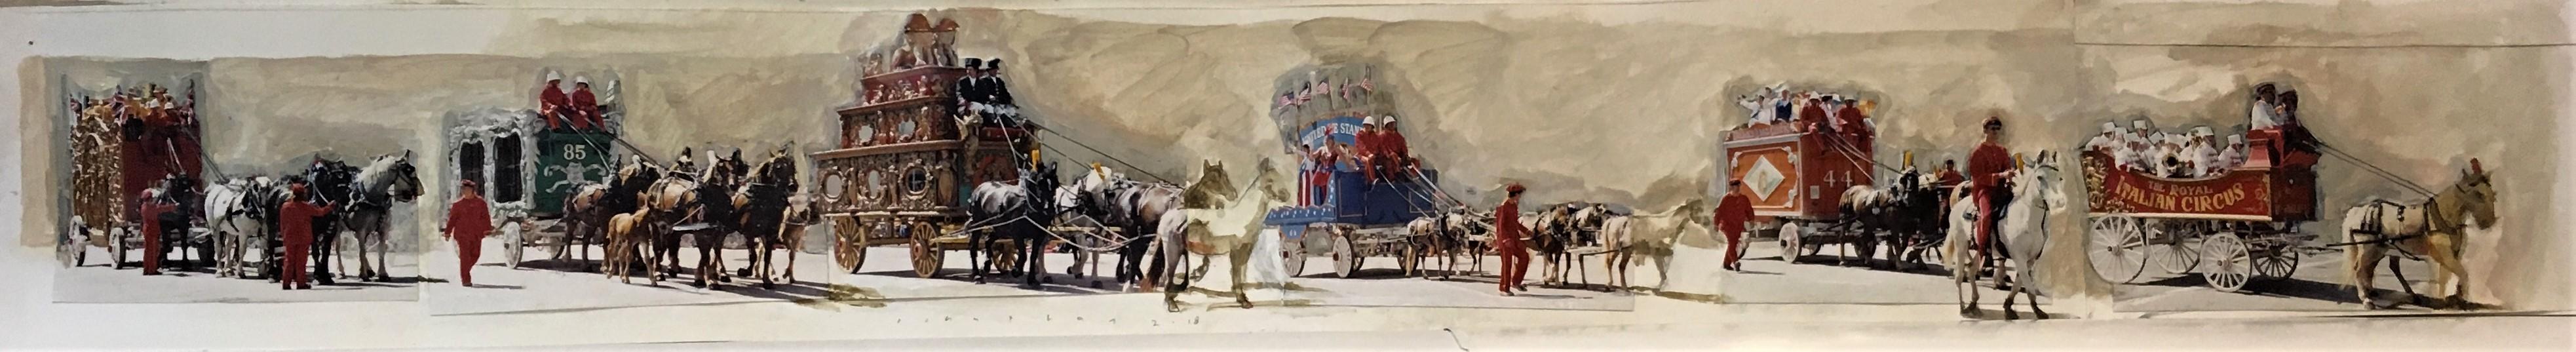 Circus Parade 2